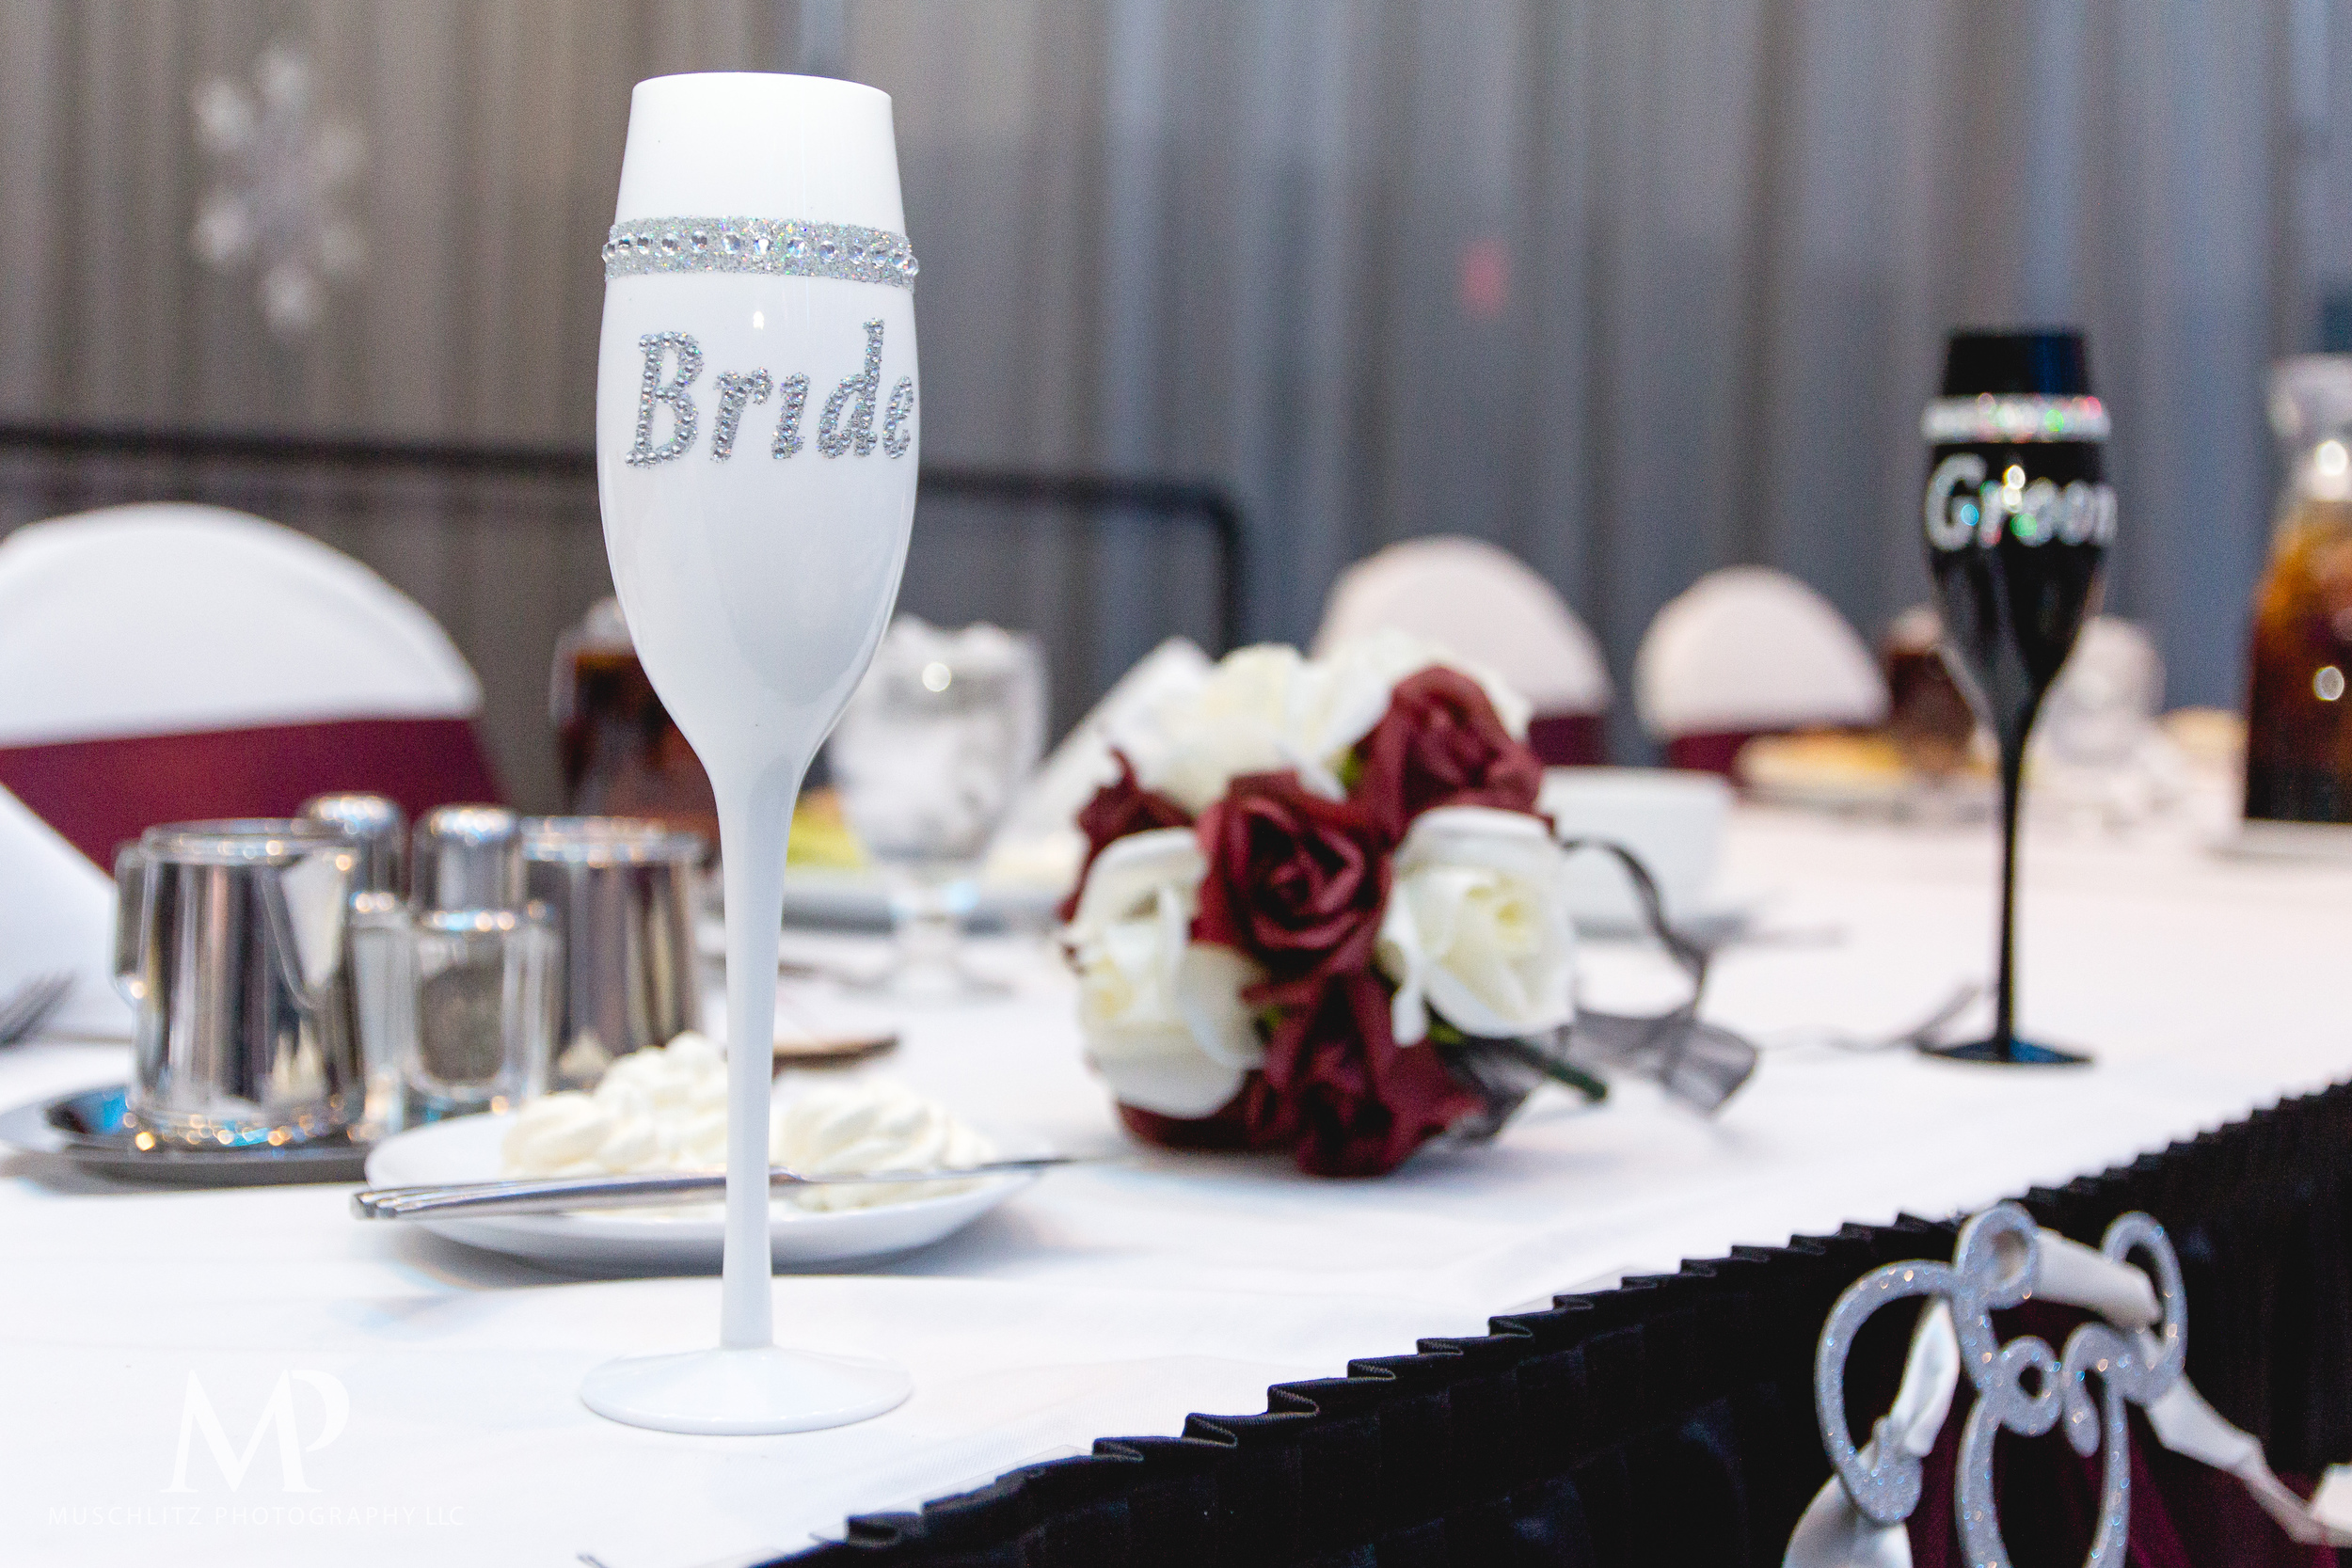 greater-columbus-convention-center-winter-wedding-ceremony-reception-portraits-columbus-ohio-muschlitz-photography-063.JPG